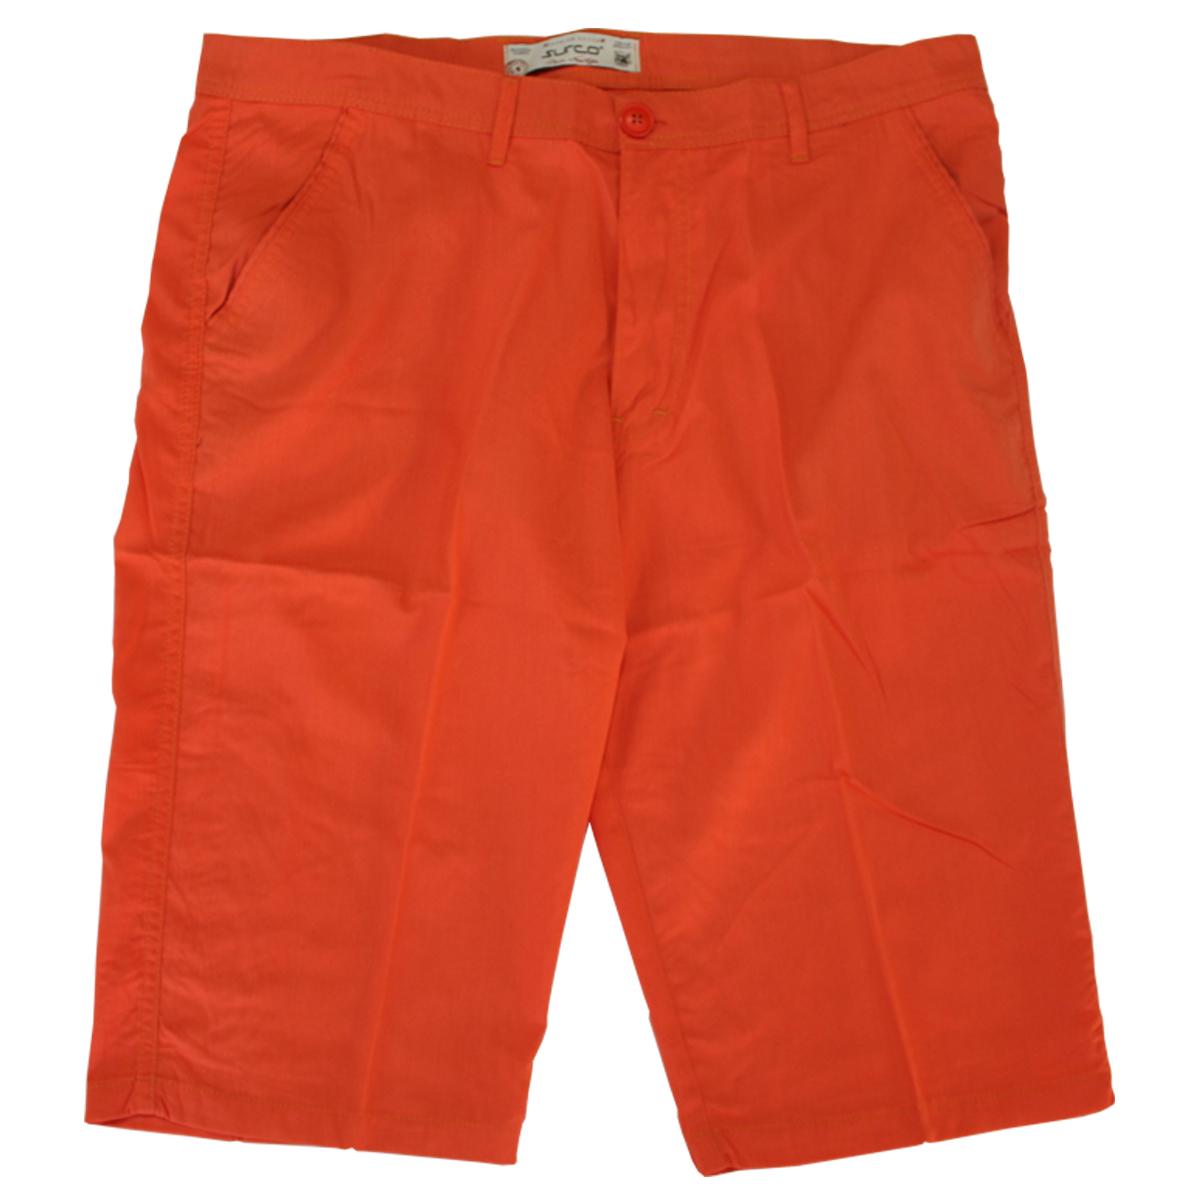 Pantalon trei sferturi portocaliu, Marime 66 - egato.ro